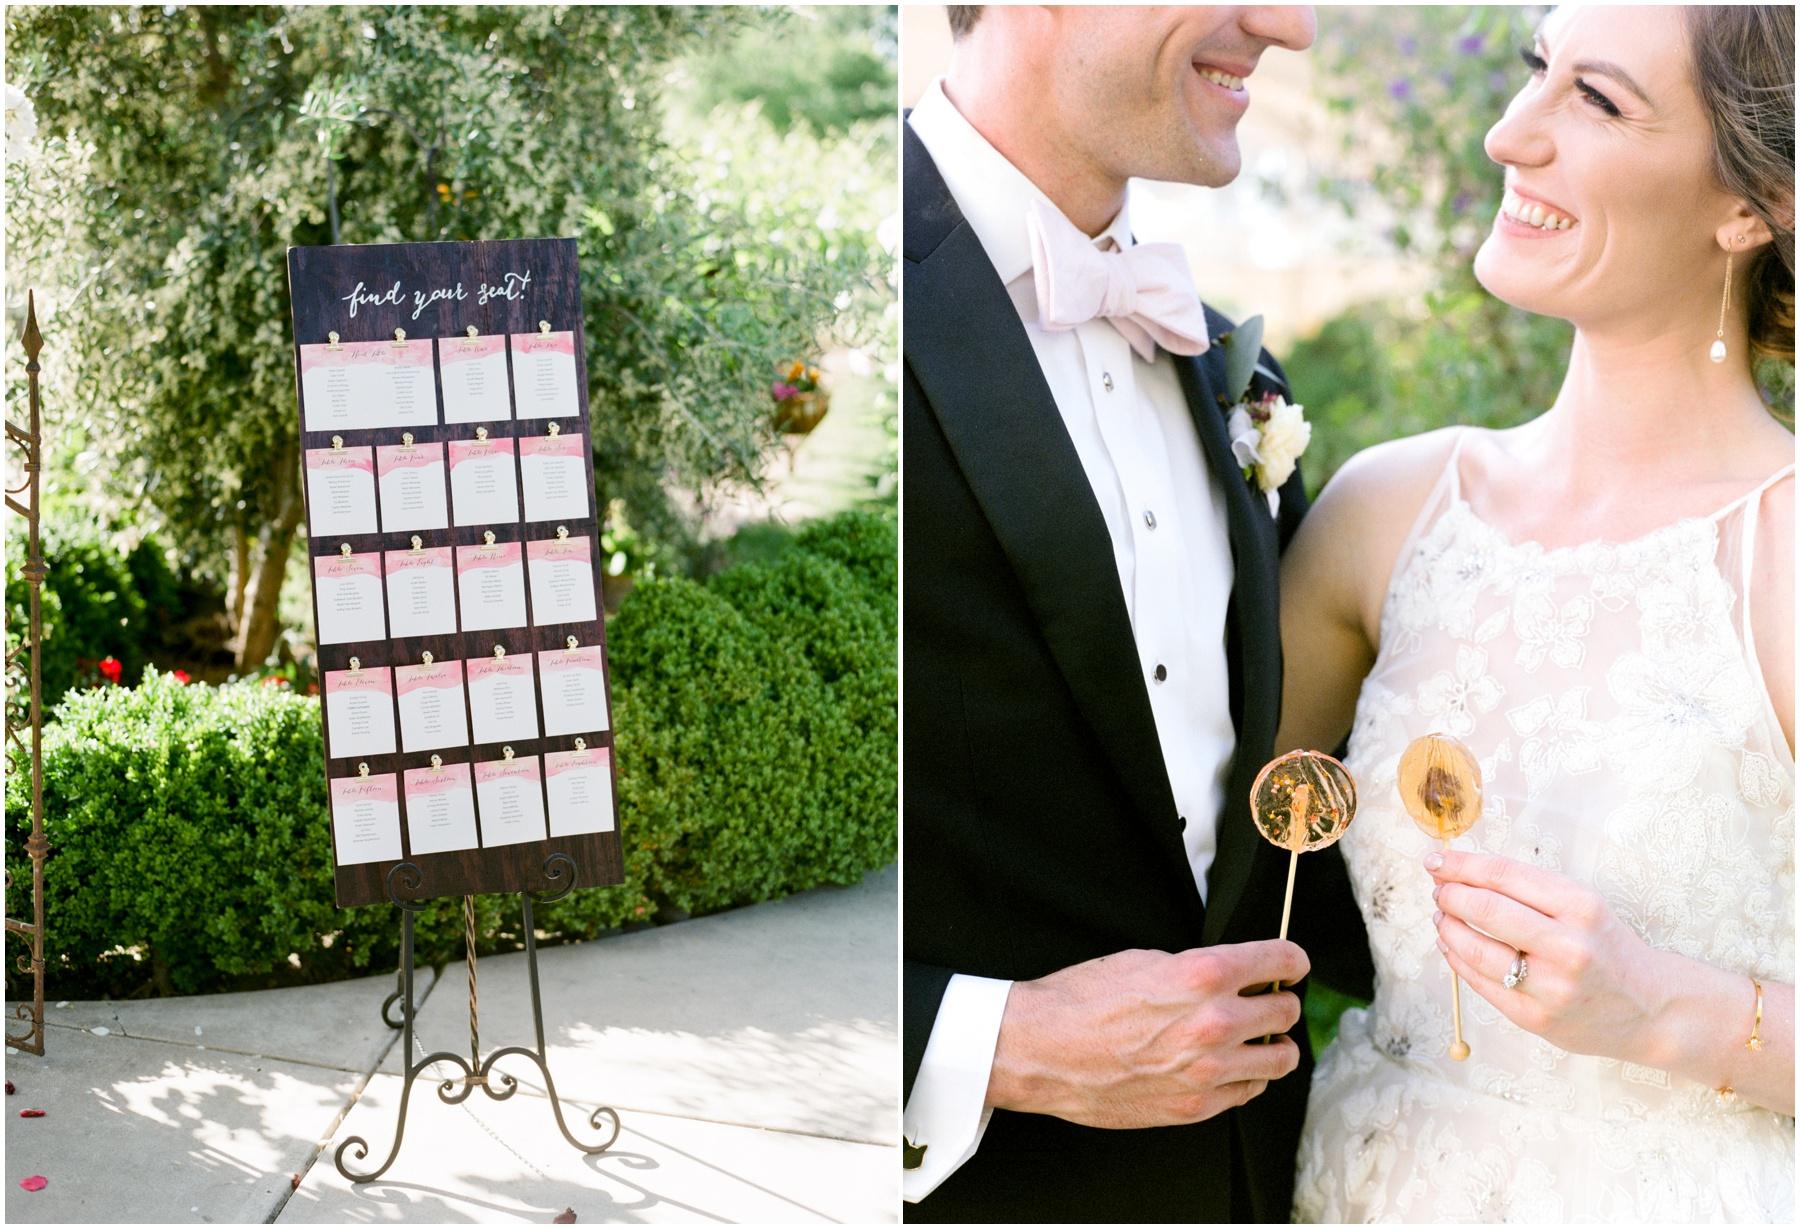 Scribner-bend-vineyards-wedding-sacramento-california-Kristine-Herman-Photography-76.jpg